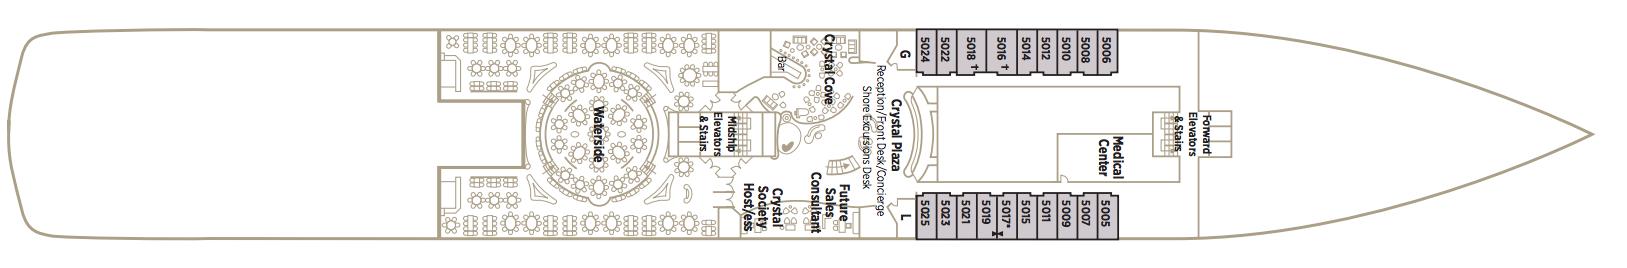 Crystal Symphony Deck Plans Crystal Deck.png